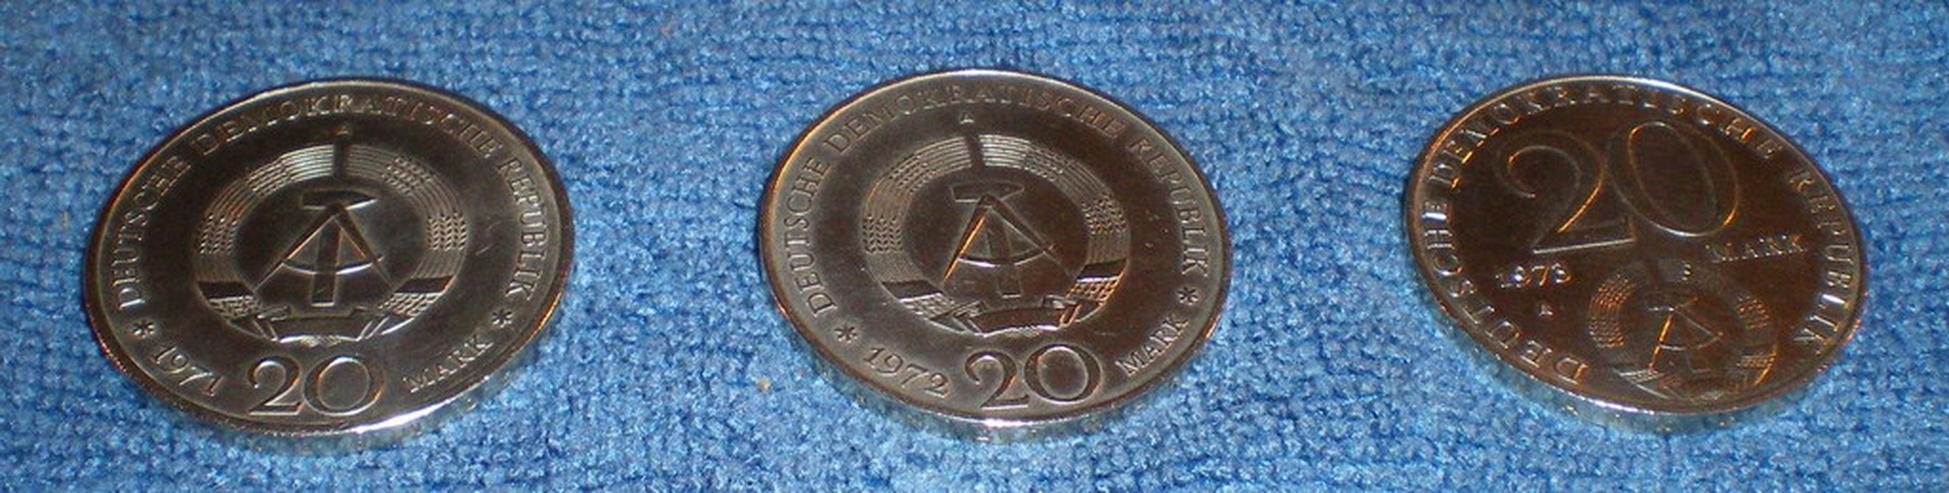 Bild 5: Münzen DDR 20 Mark Stücke (Gedenkmünzen) (VB)